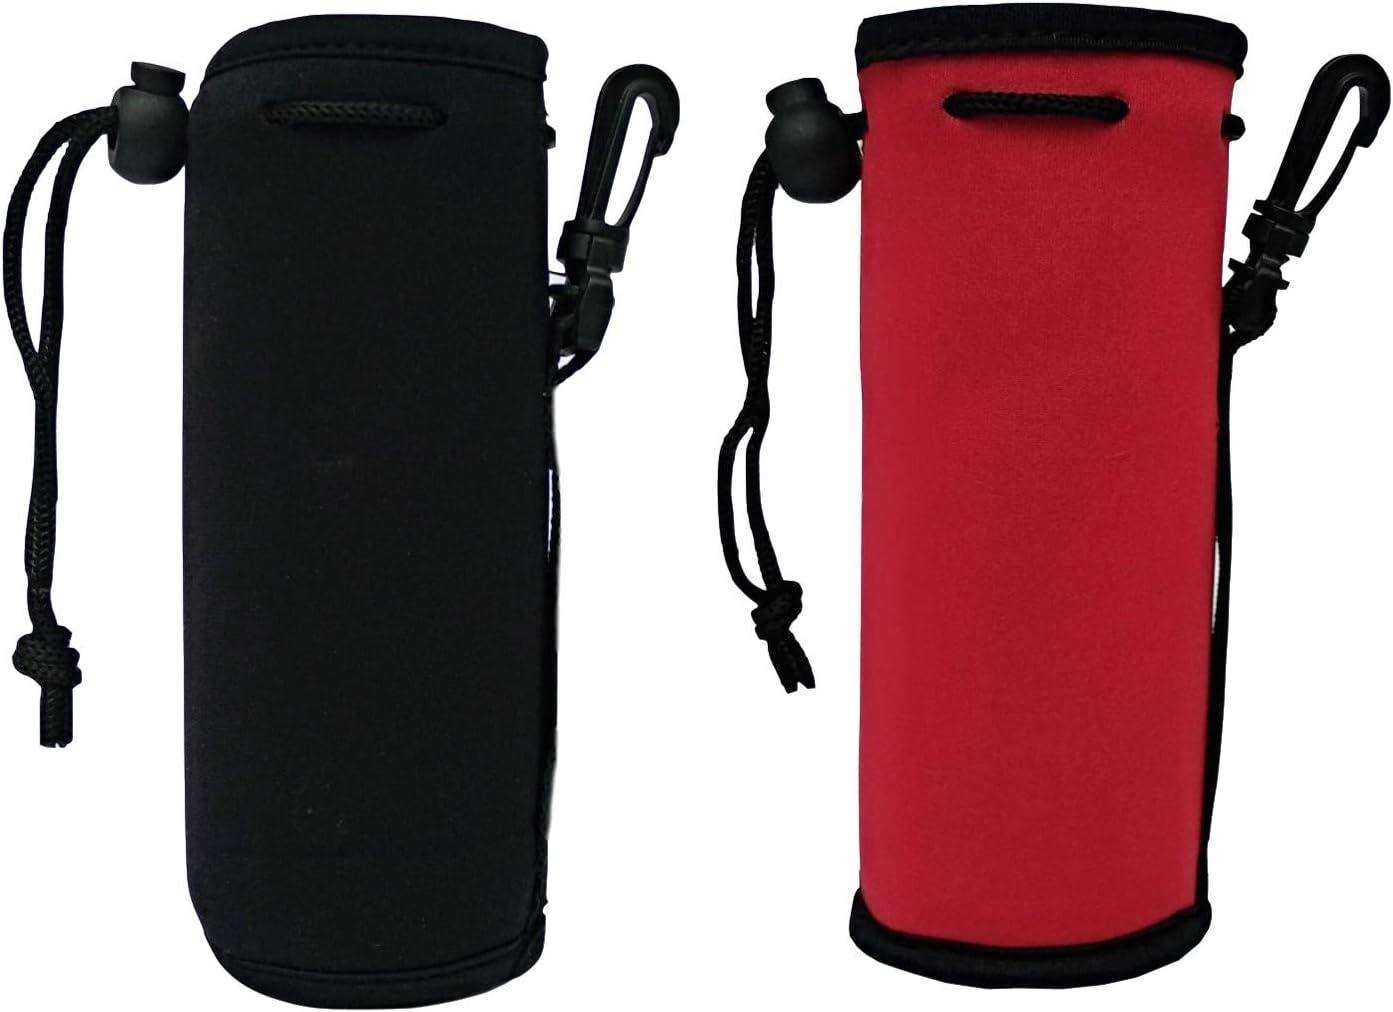 2 Pack Insulated Neoprene Bottle Sleeves Carrier Neoprene Holder Bag Protect for Cooler/Coolie/Cover/Insulator/Holder/Huggie/Sleeve for 16.9 oz Water and Drink Bottle (Red/Black)